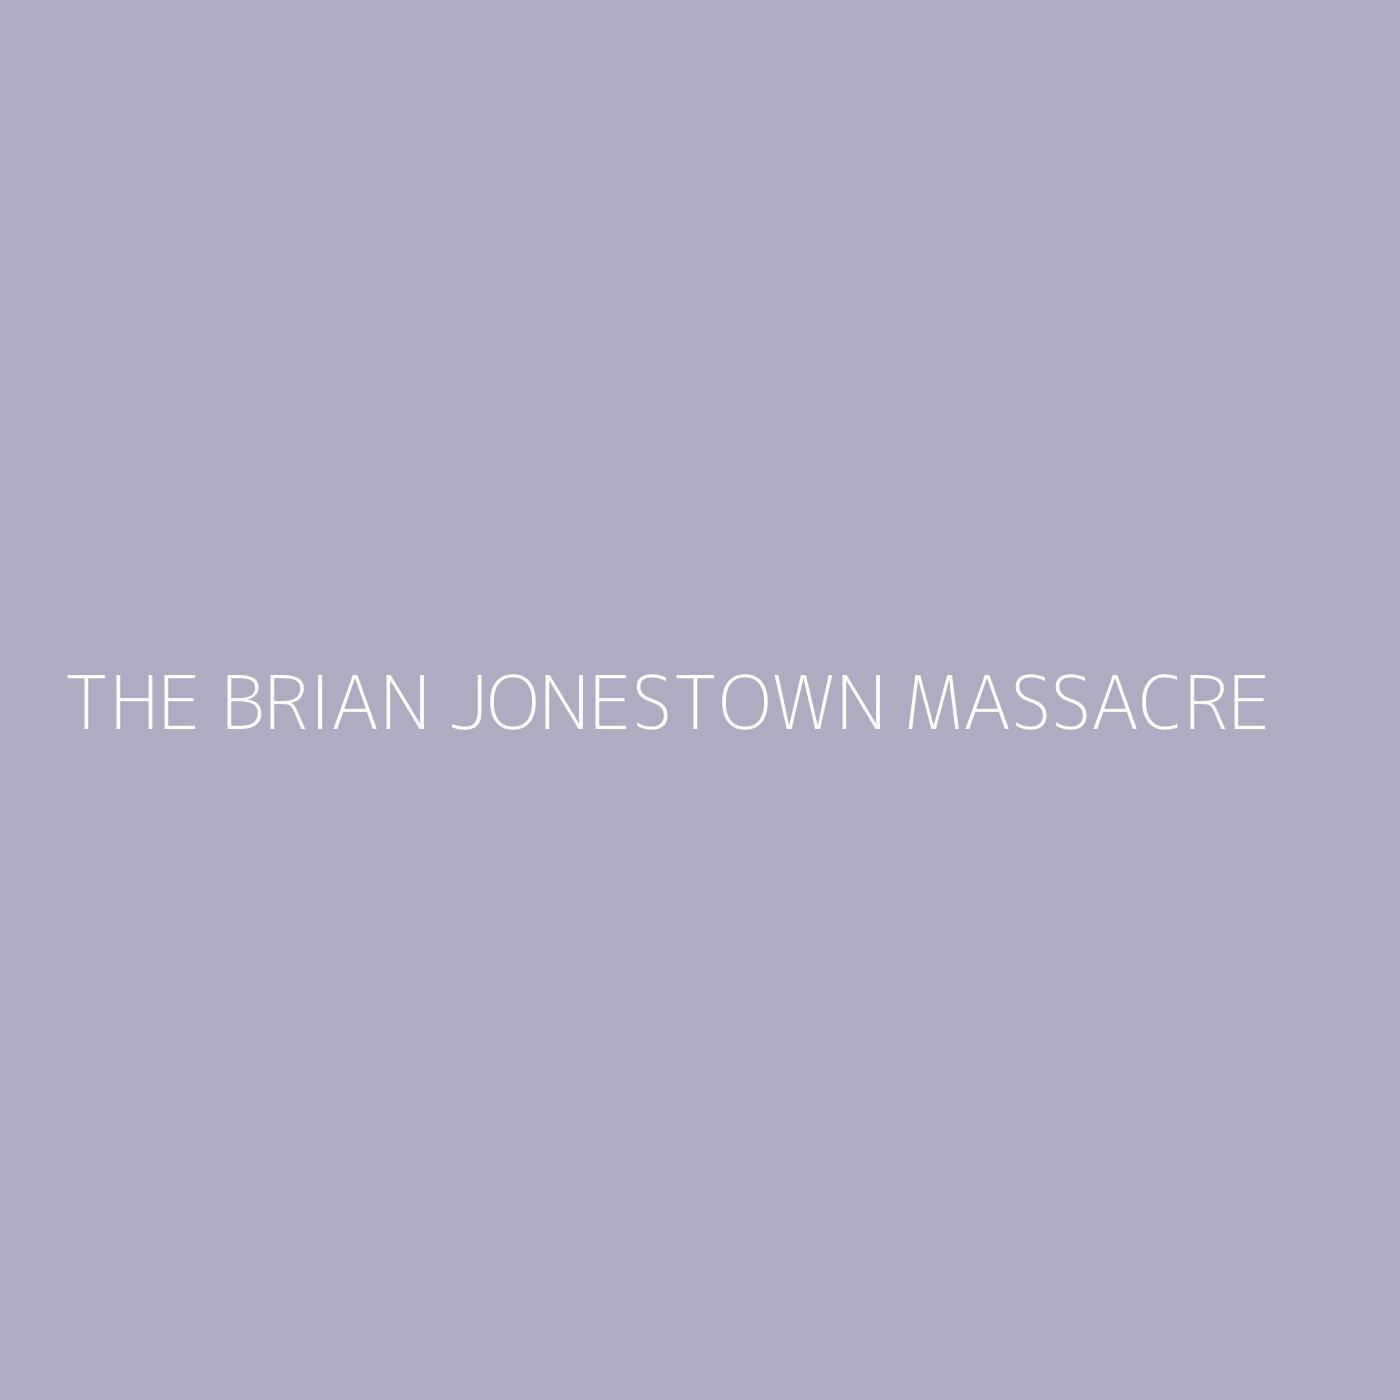 The Brian Jonestown Massacre Playlist Artwork